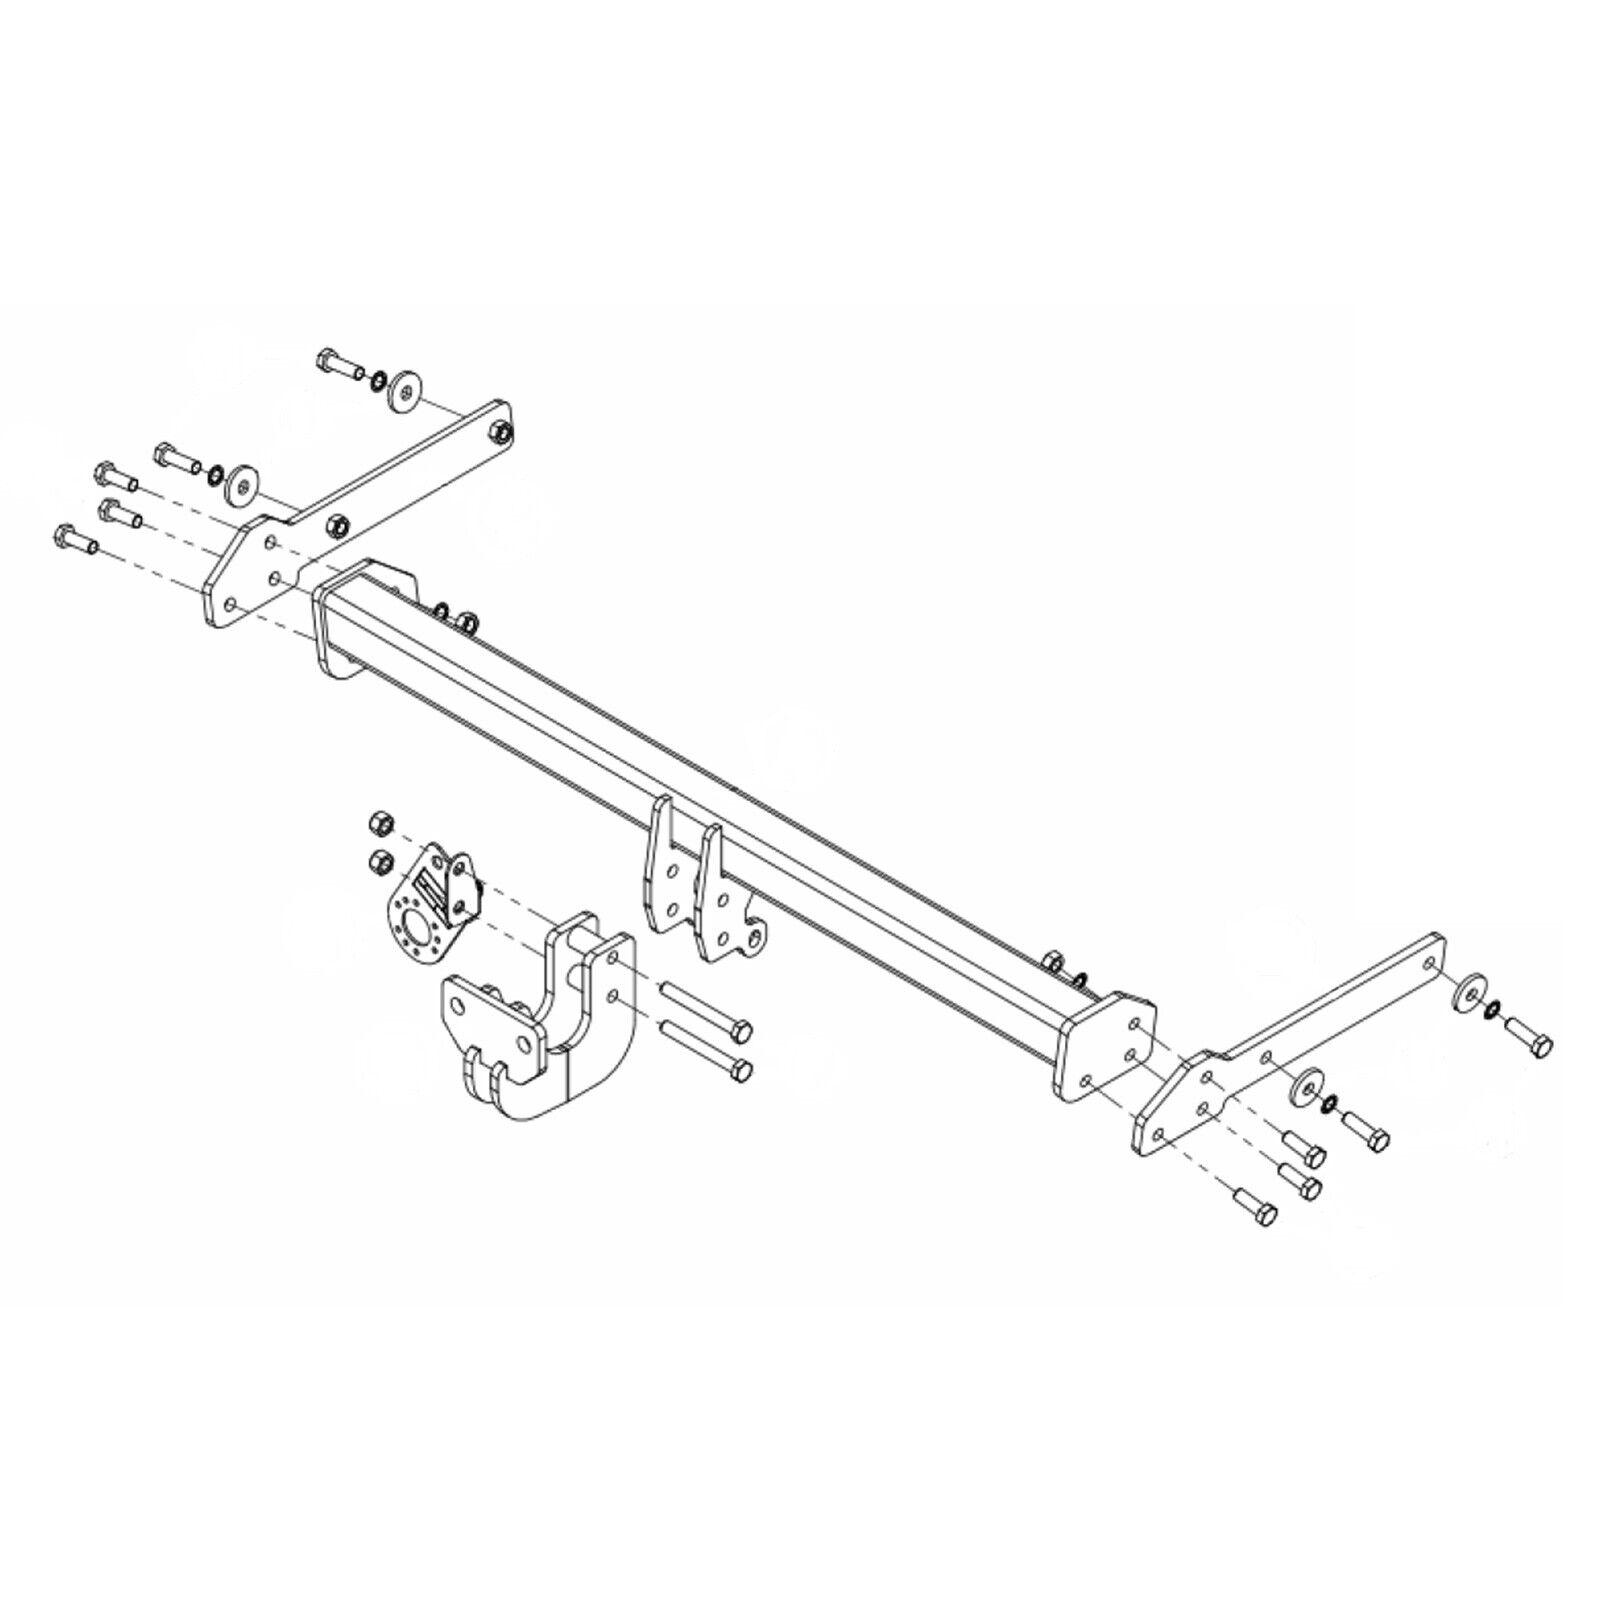 medium resolution of details about towbar for skoda octavia estate 2013 onwards flange tow bar